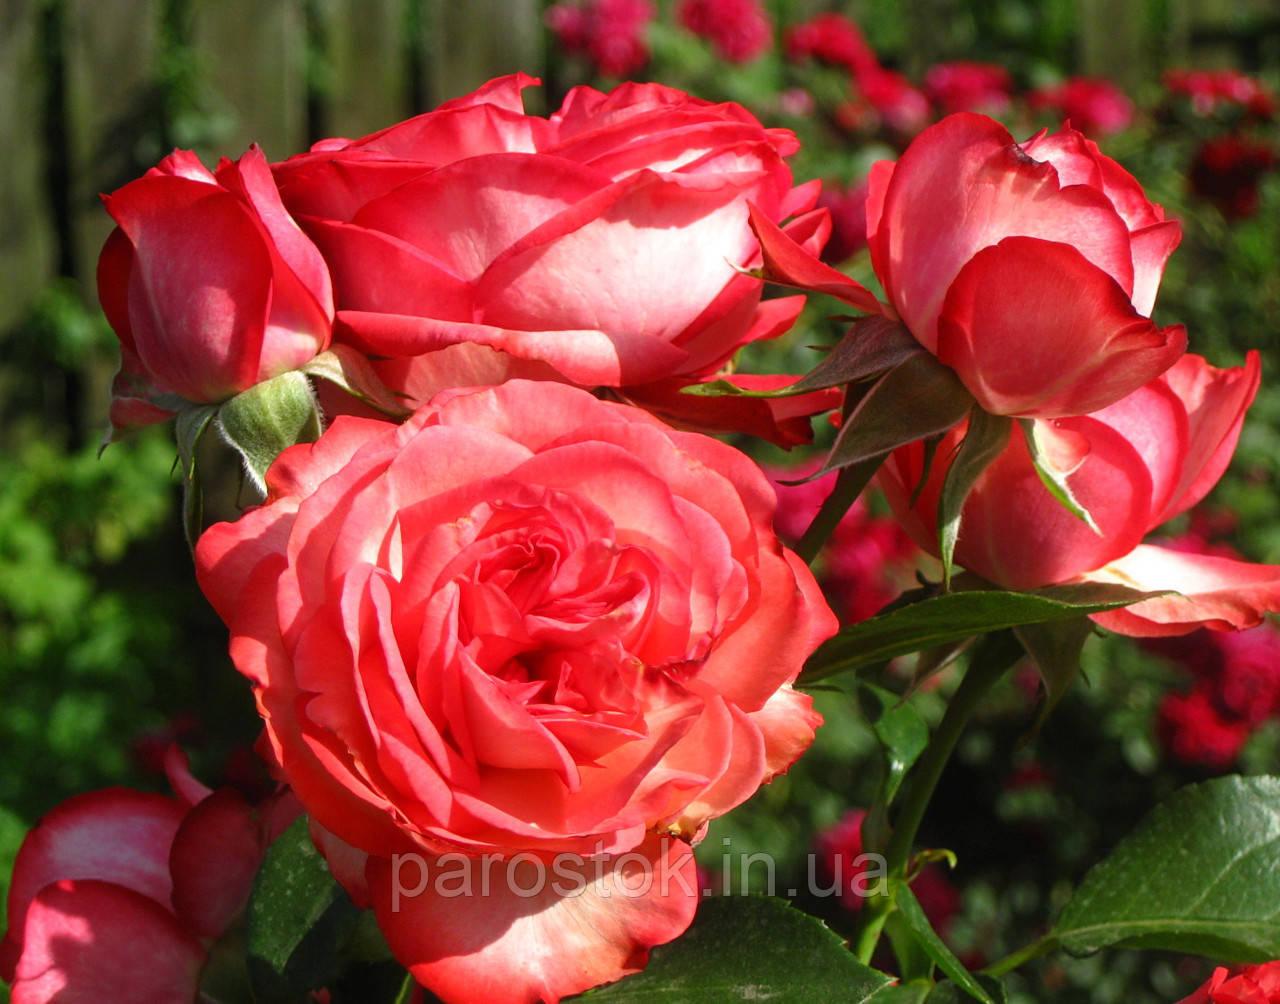 Саженцы роз Антик . (вв). Плетистая роза